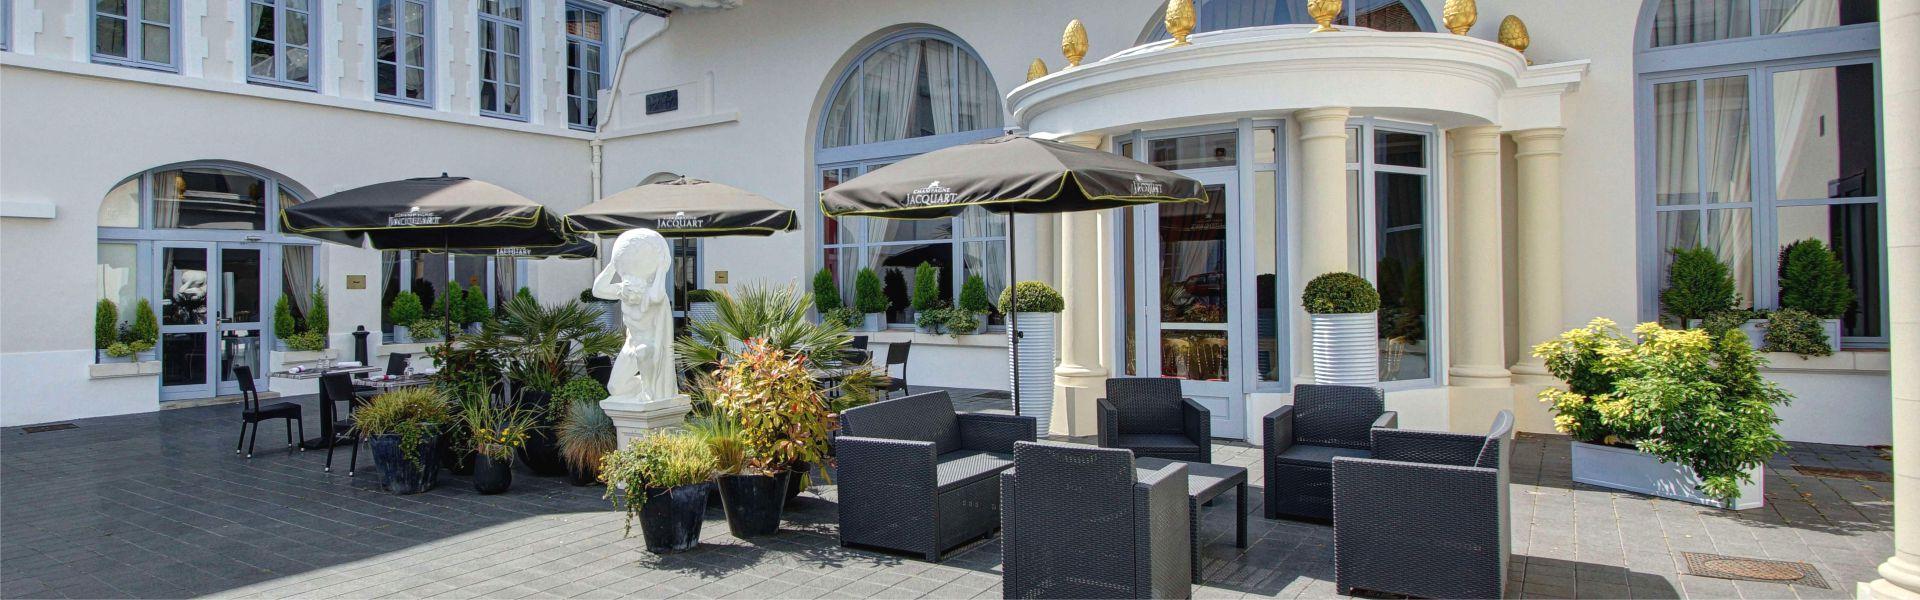 La terrasse du Najeti Hôtel de l'Univers